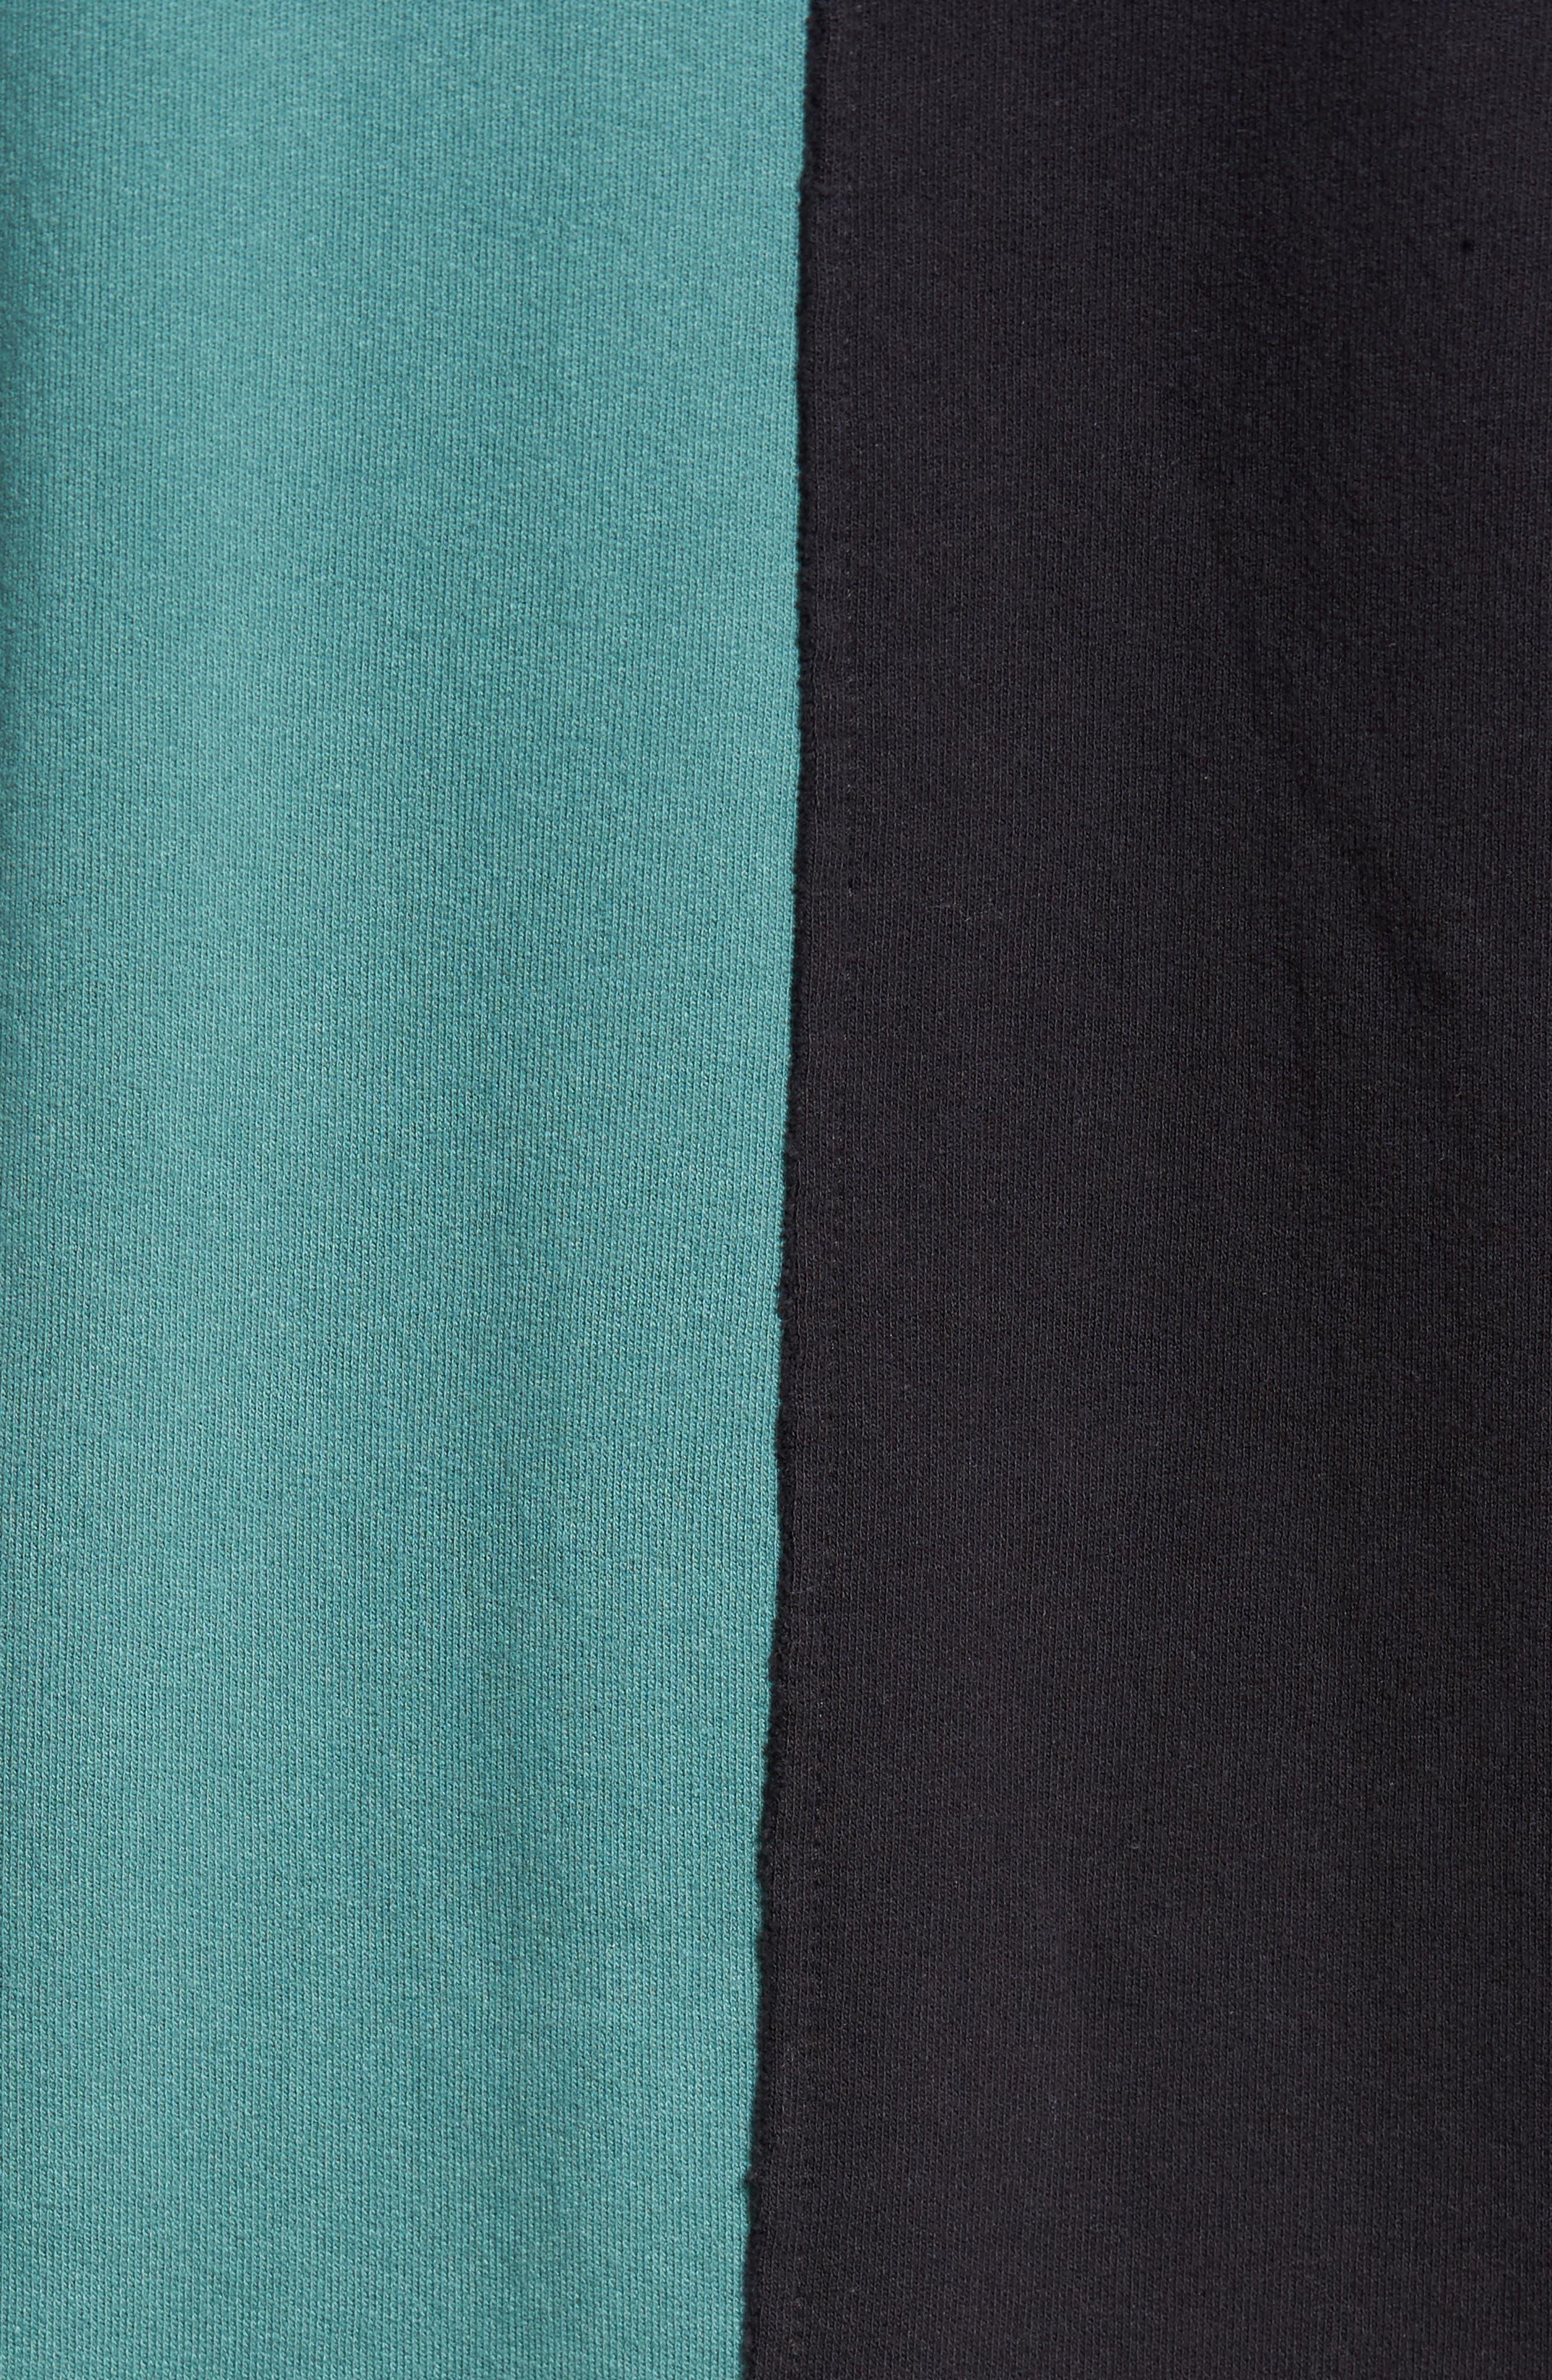 Colorblock T-Shirt,                             Alternate thumbnail 5, color,                             001